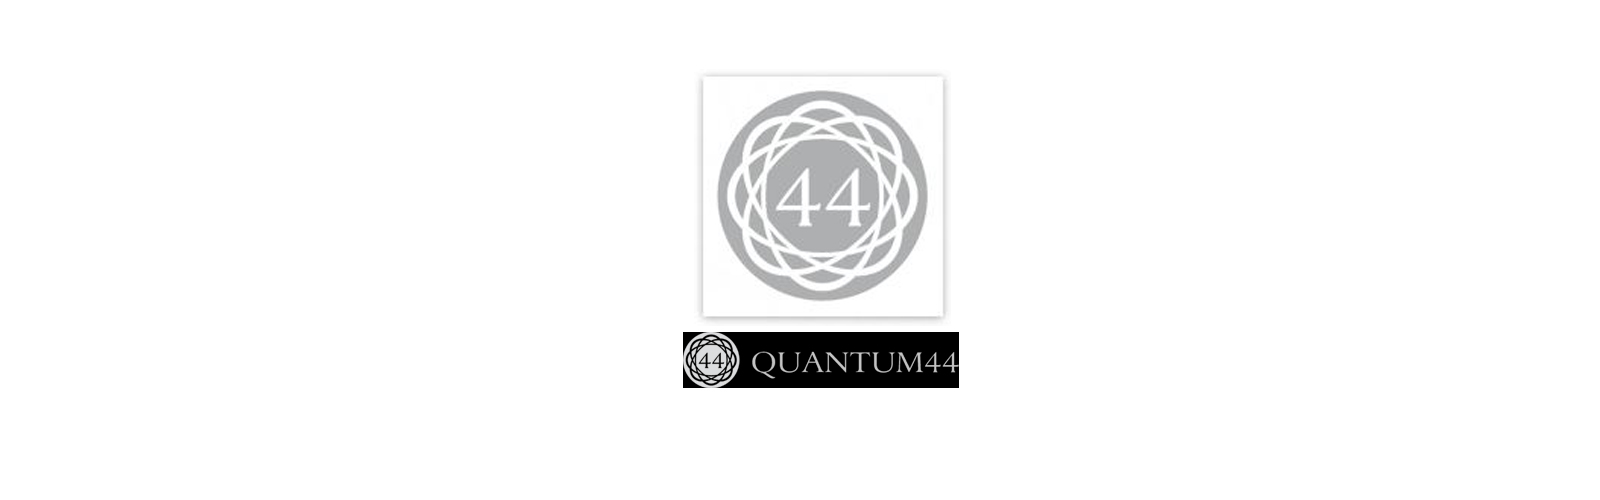 http://www.quantum44.com/